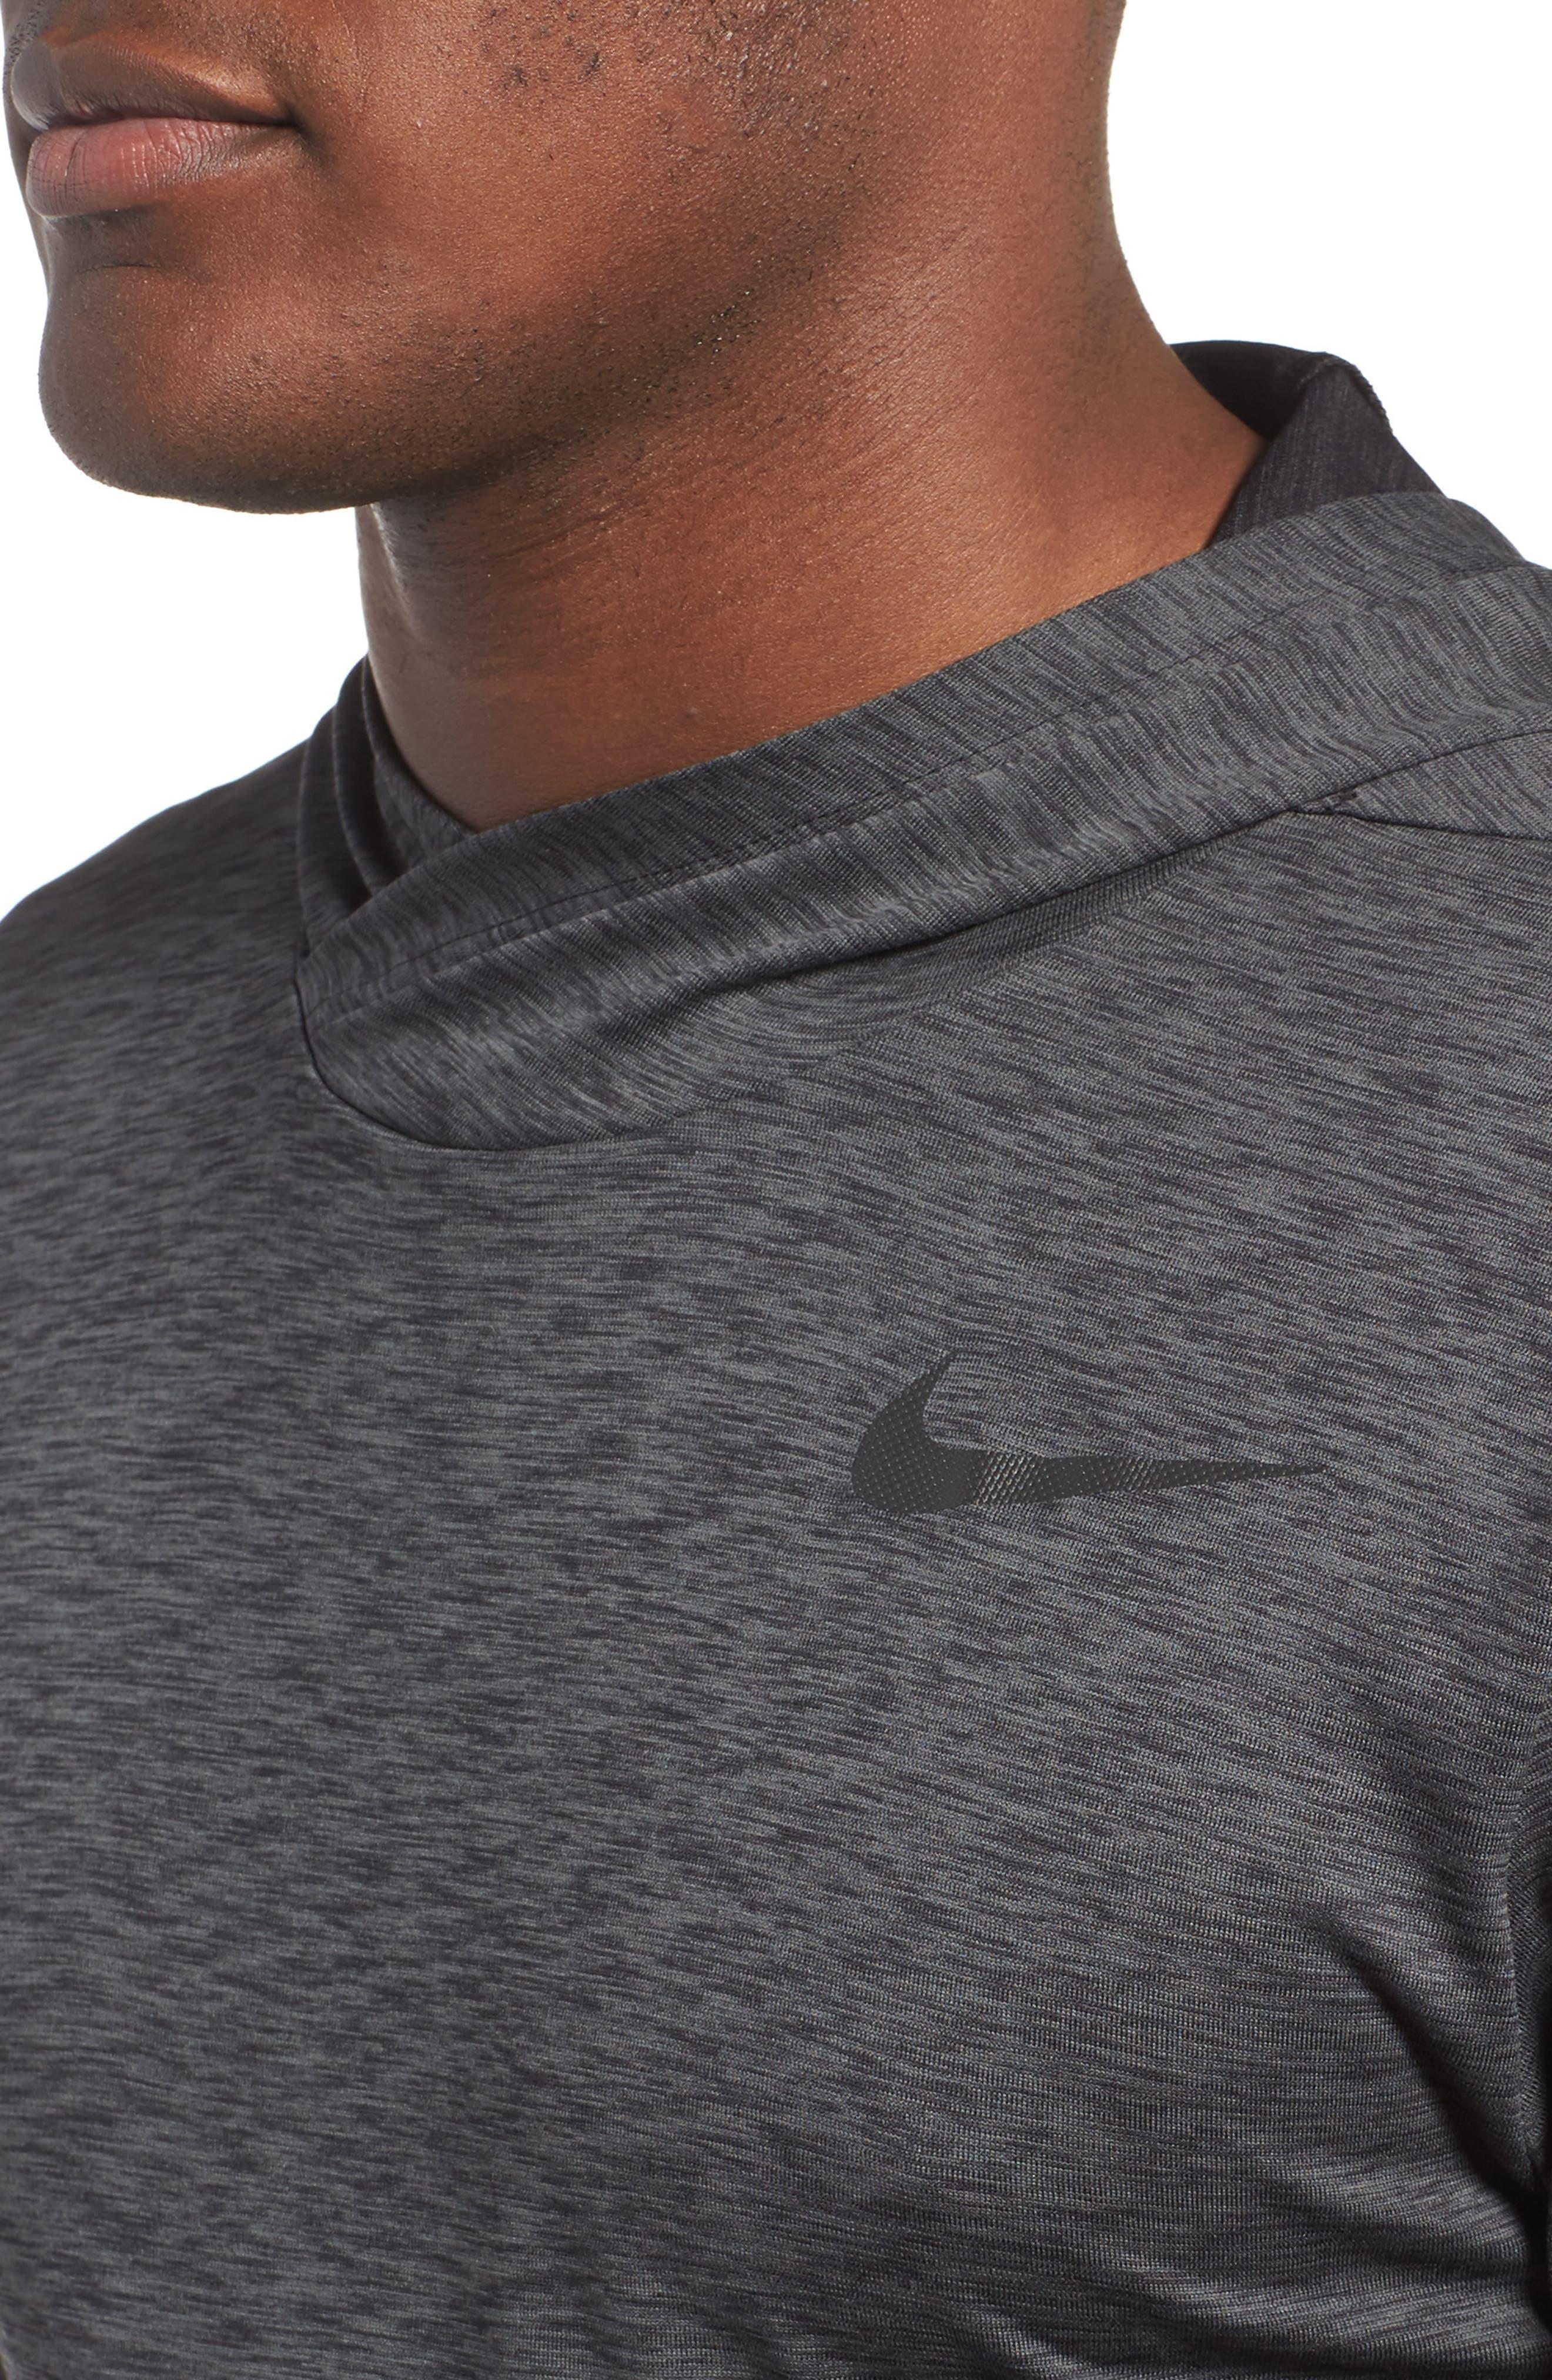 Hyper Dry Regular Fit Training Hoodie,                             Alternate thumbnail 4, color,                             ANTHRACITE/BLACK/BLACK